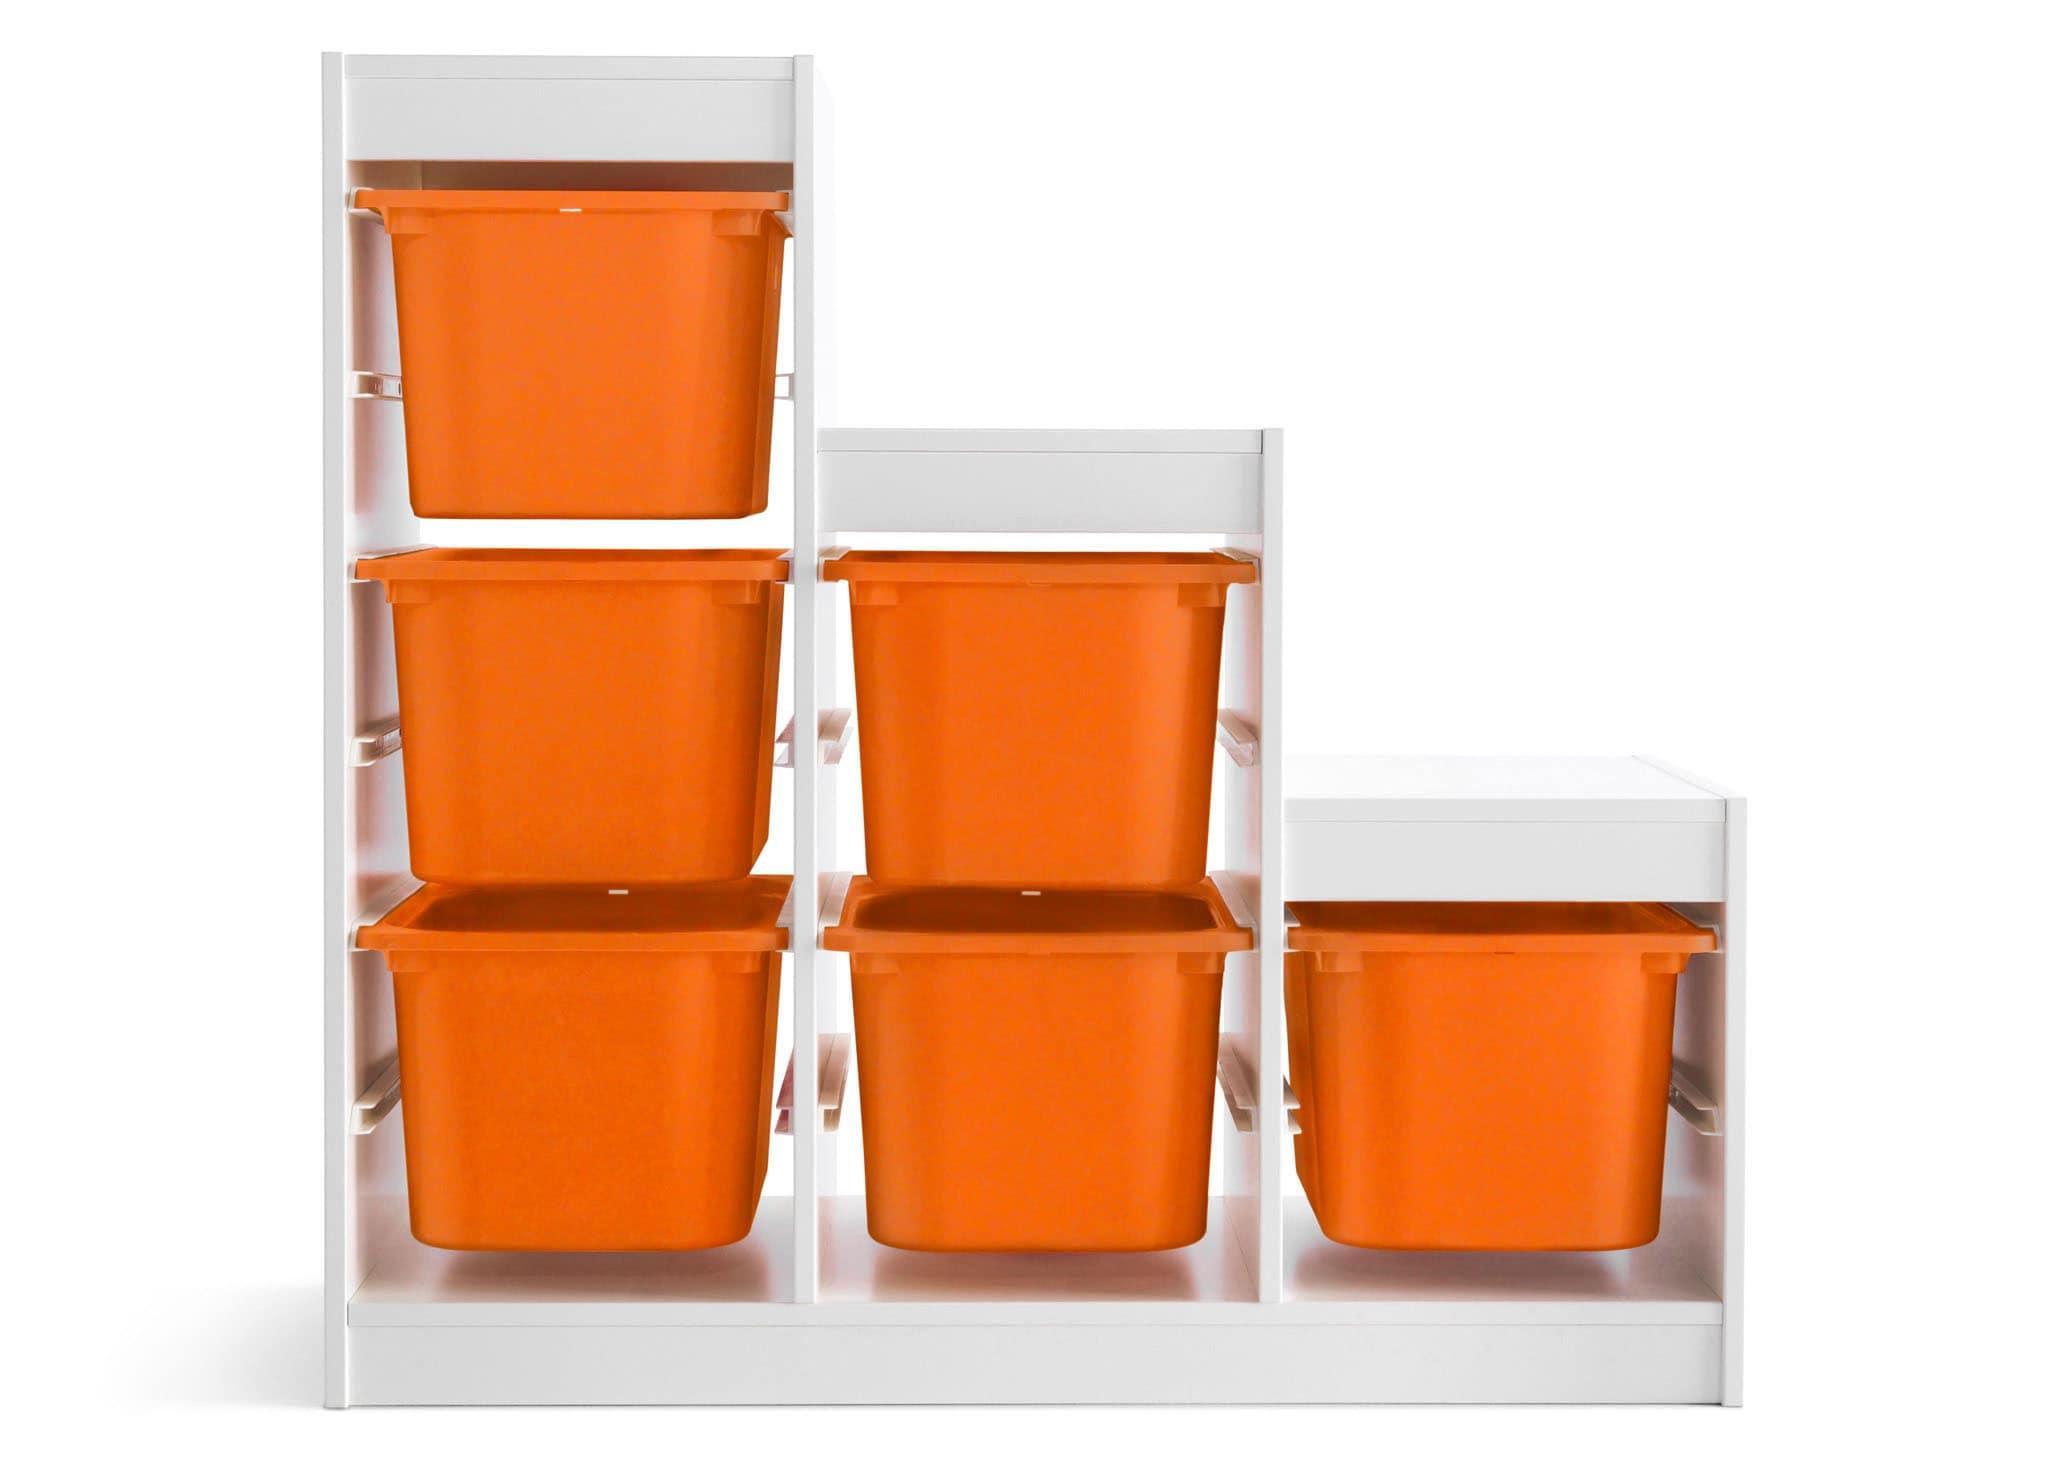 Mueble Almacenaje Juguetes Ipdd Muebles Infantiles Y Almacenaje Para Nià Os Pra Online Ikea